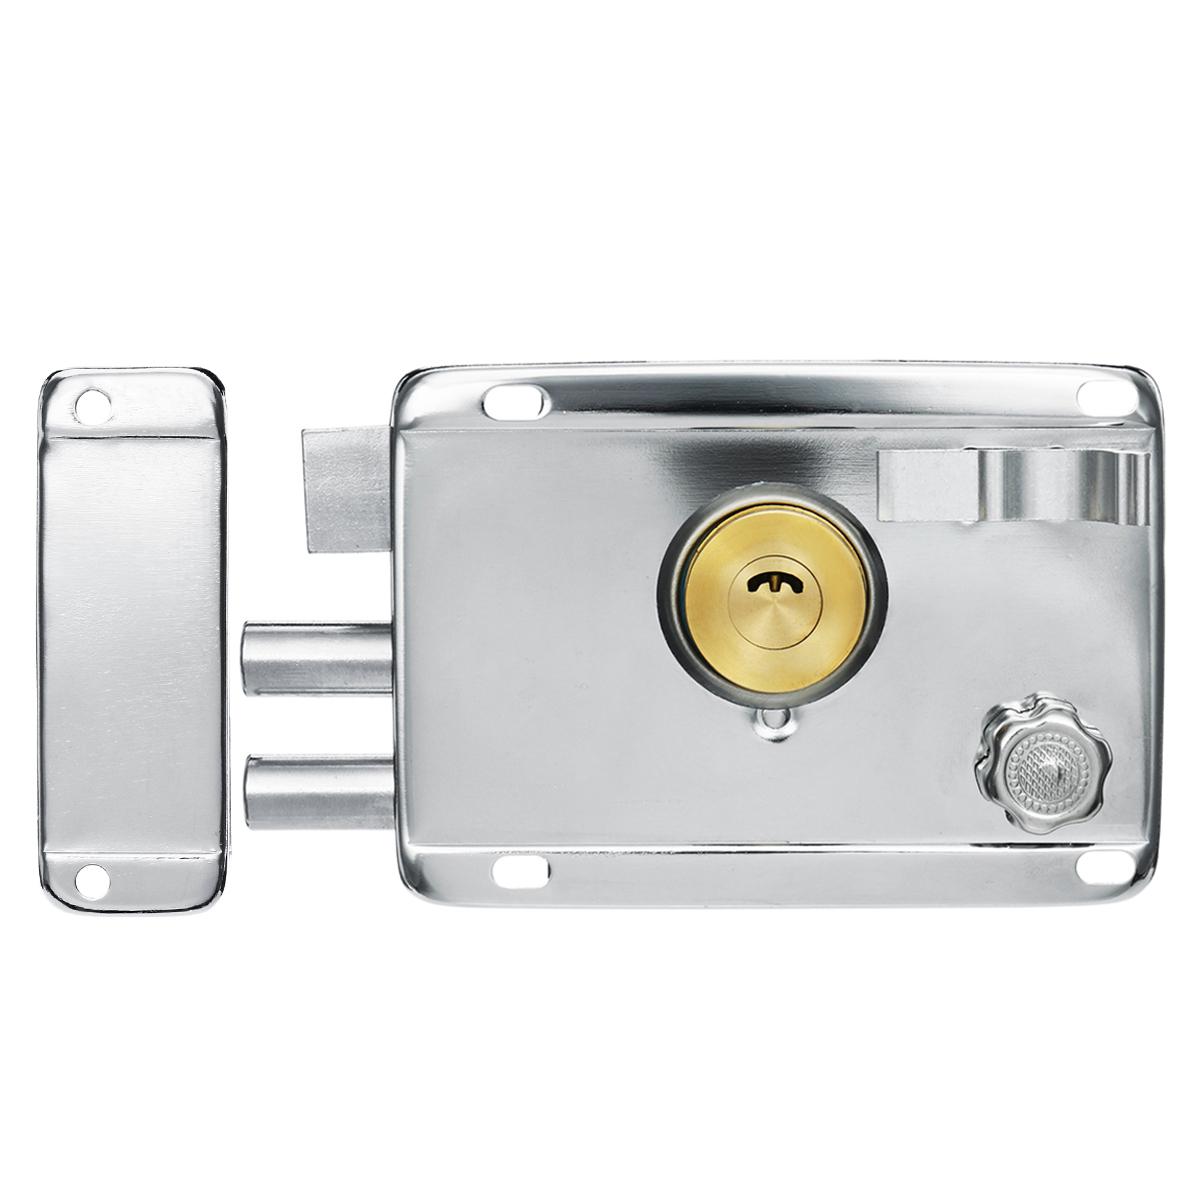 Exterior Iron Door Locks Security Anti-theft Lock Multiple Insurance Lock Wood Gate Lock For Furniture Hardware